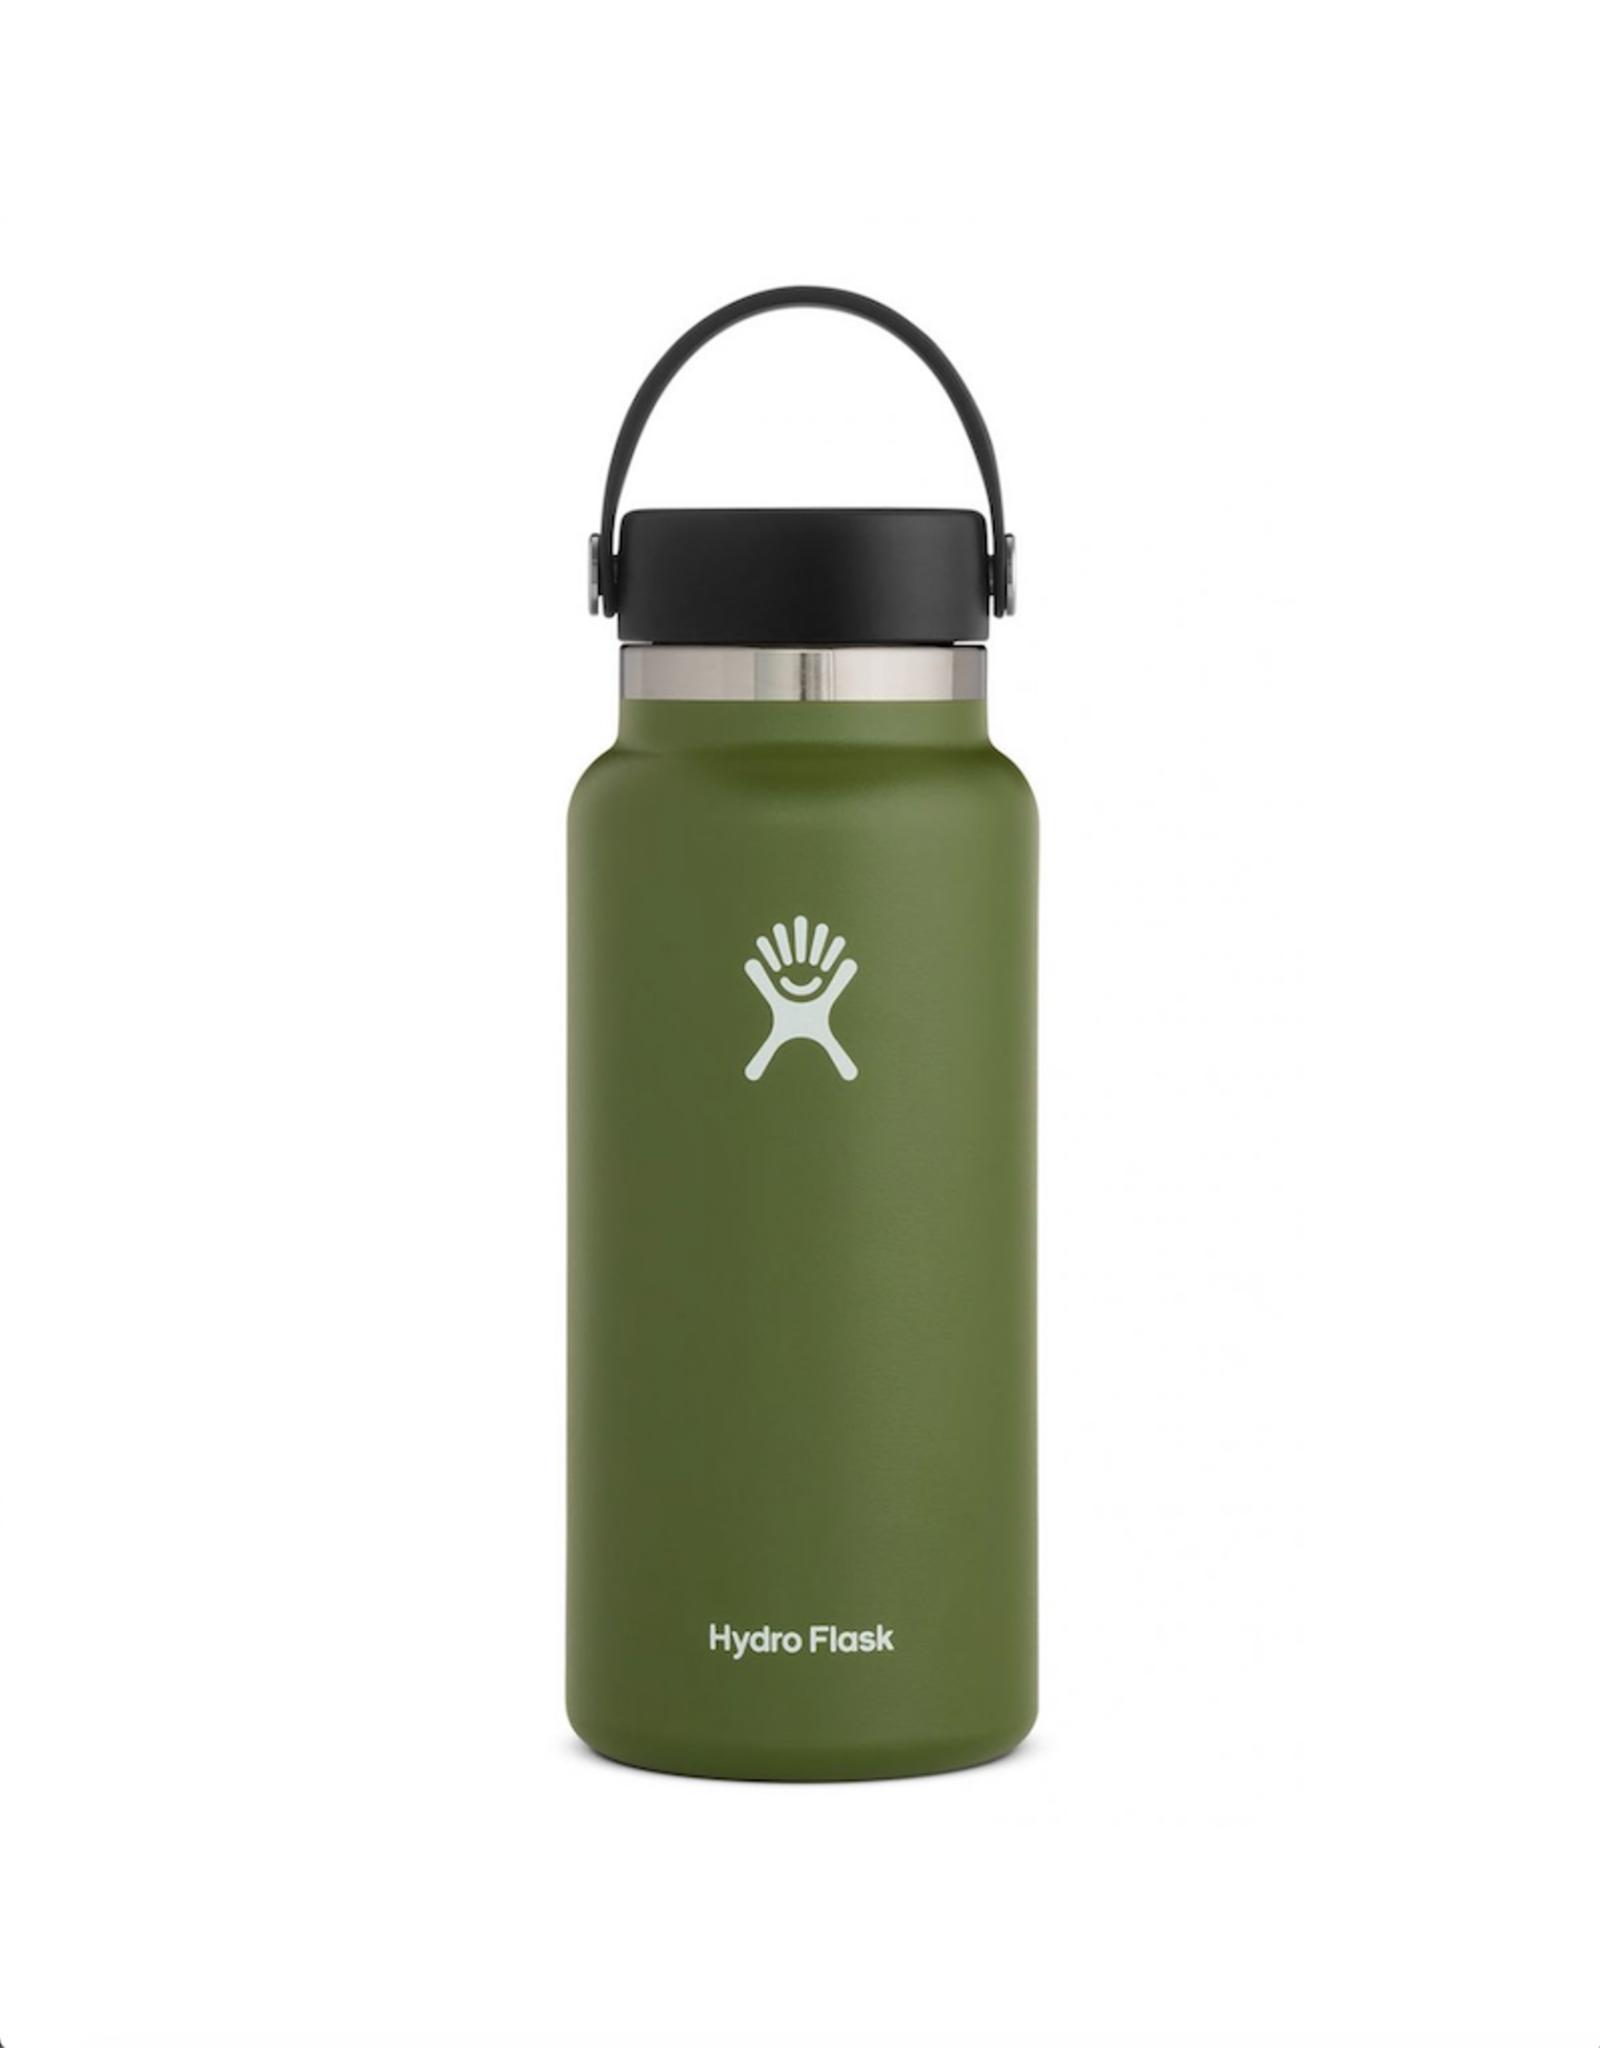 Hydro Flask 32 oz Wide Mouth Flex Cap Bottle in Olive